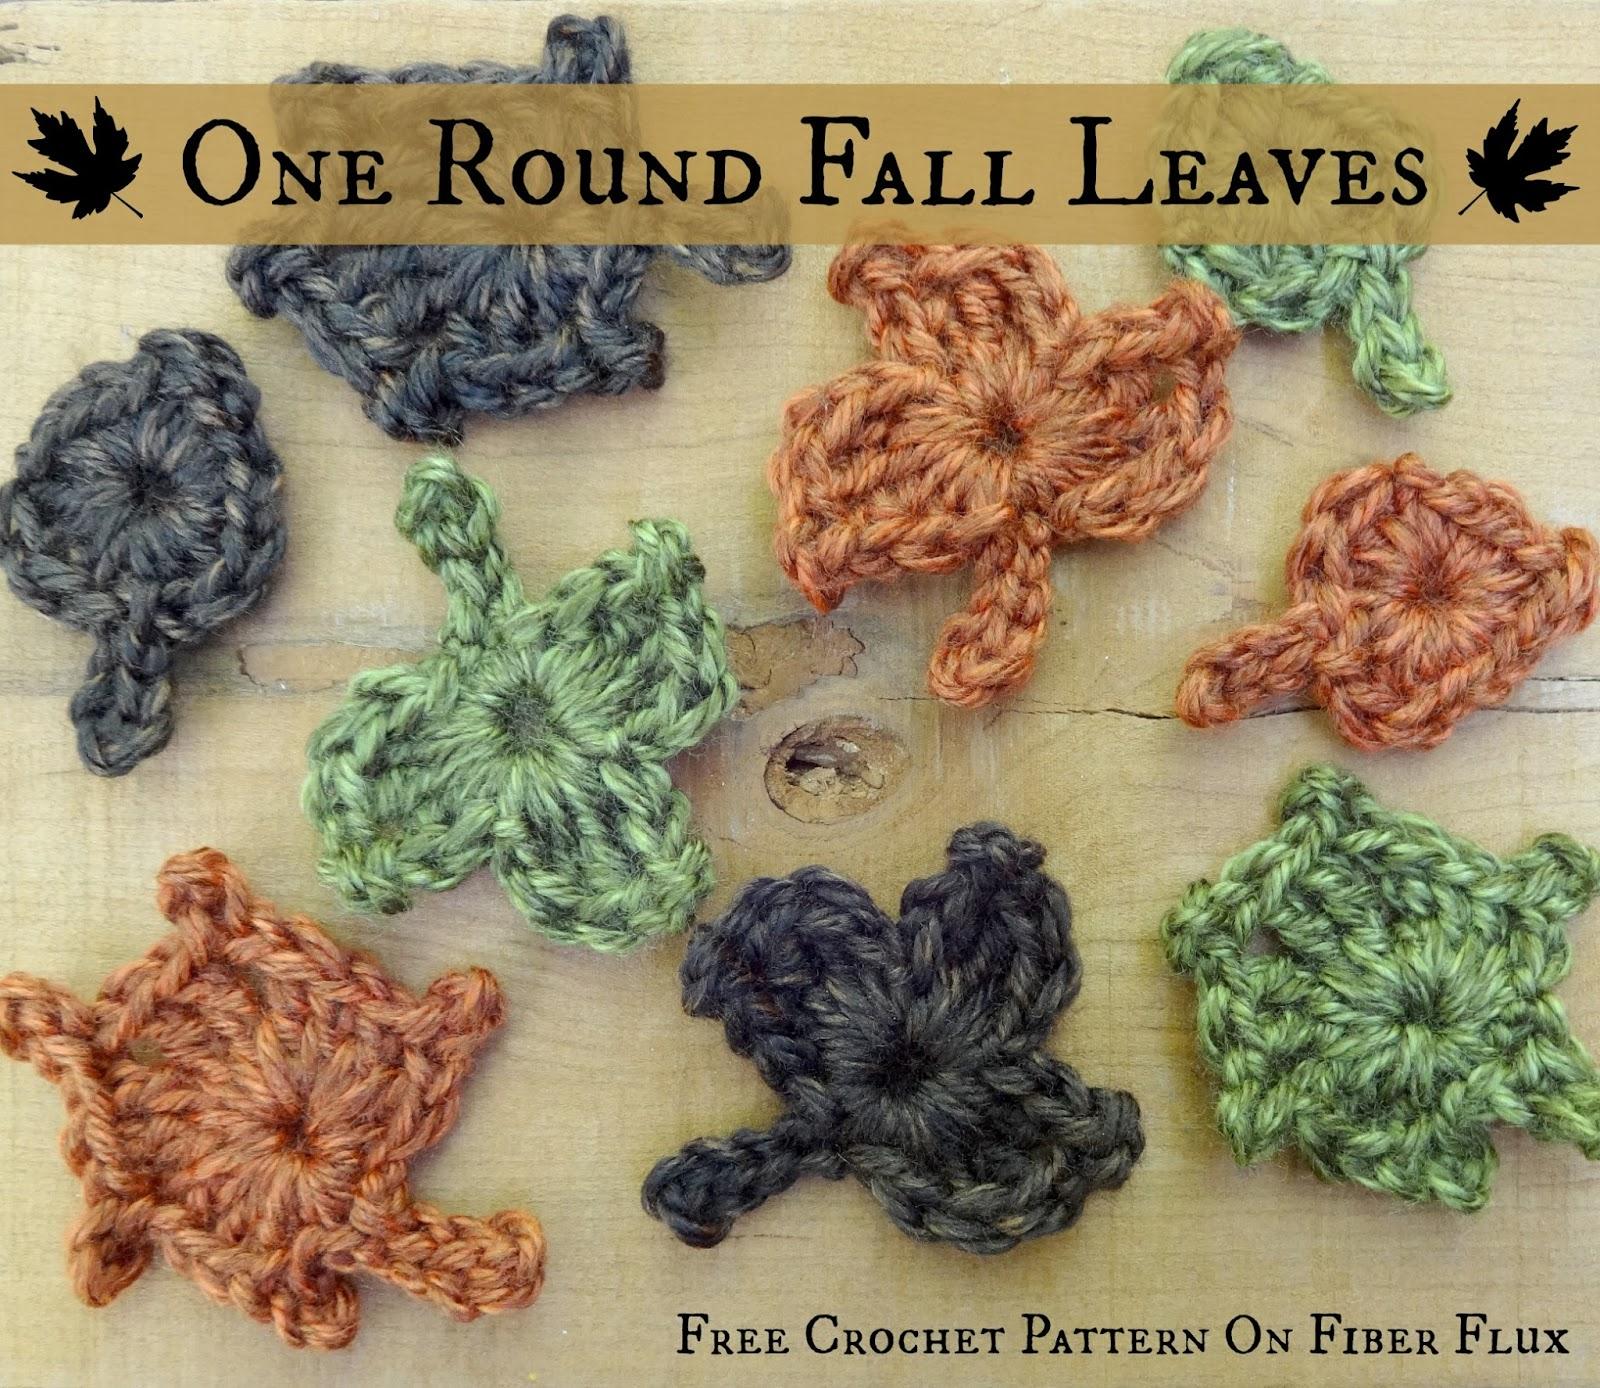 Fiber Flux: Free Crochet Pattern...One Round Fall Leaves!